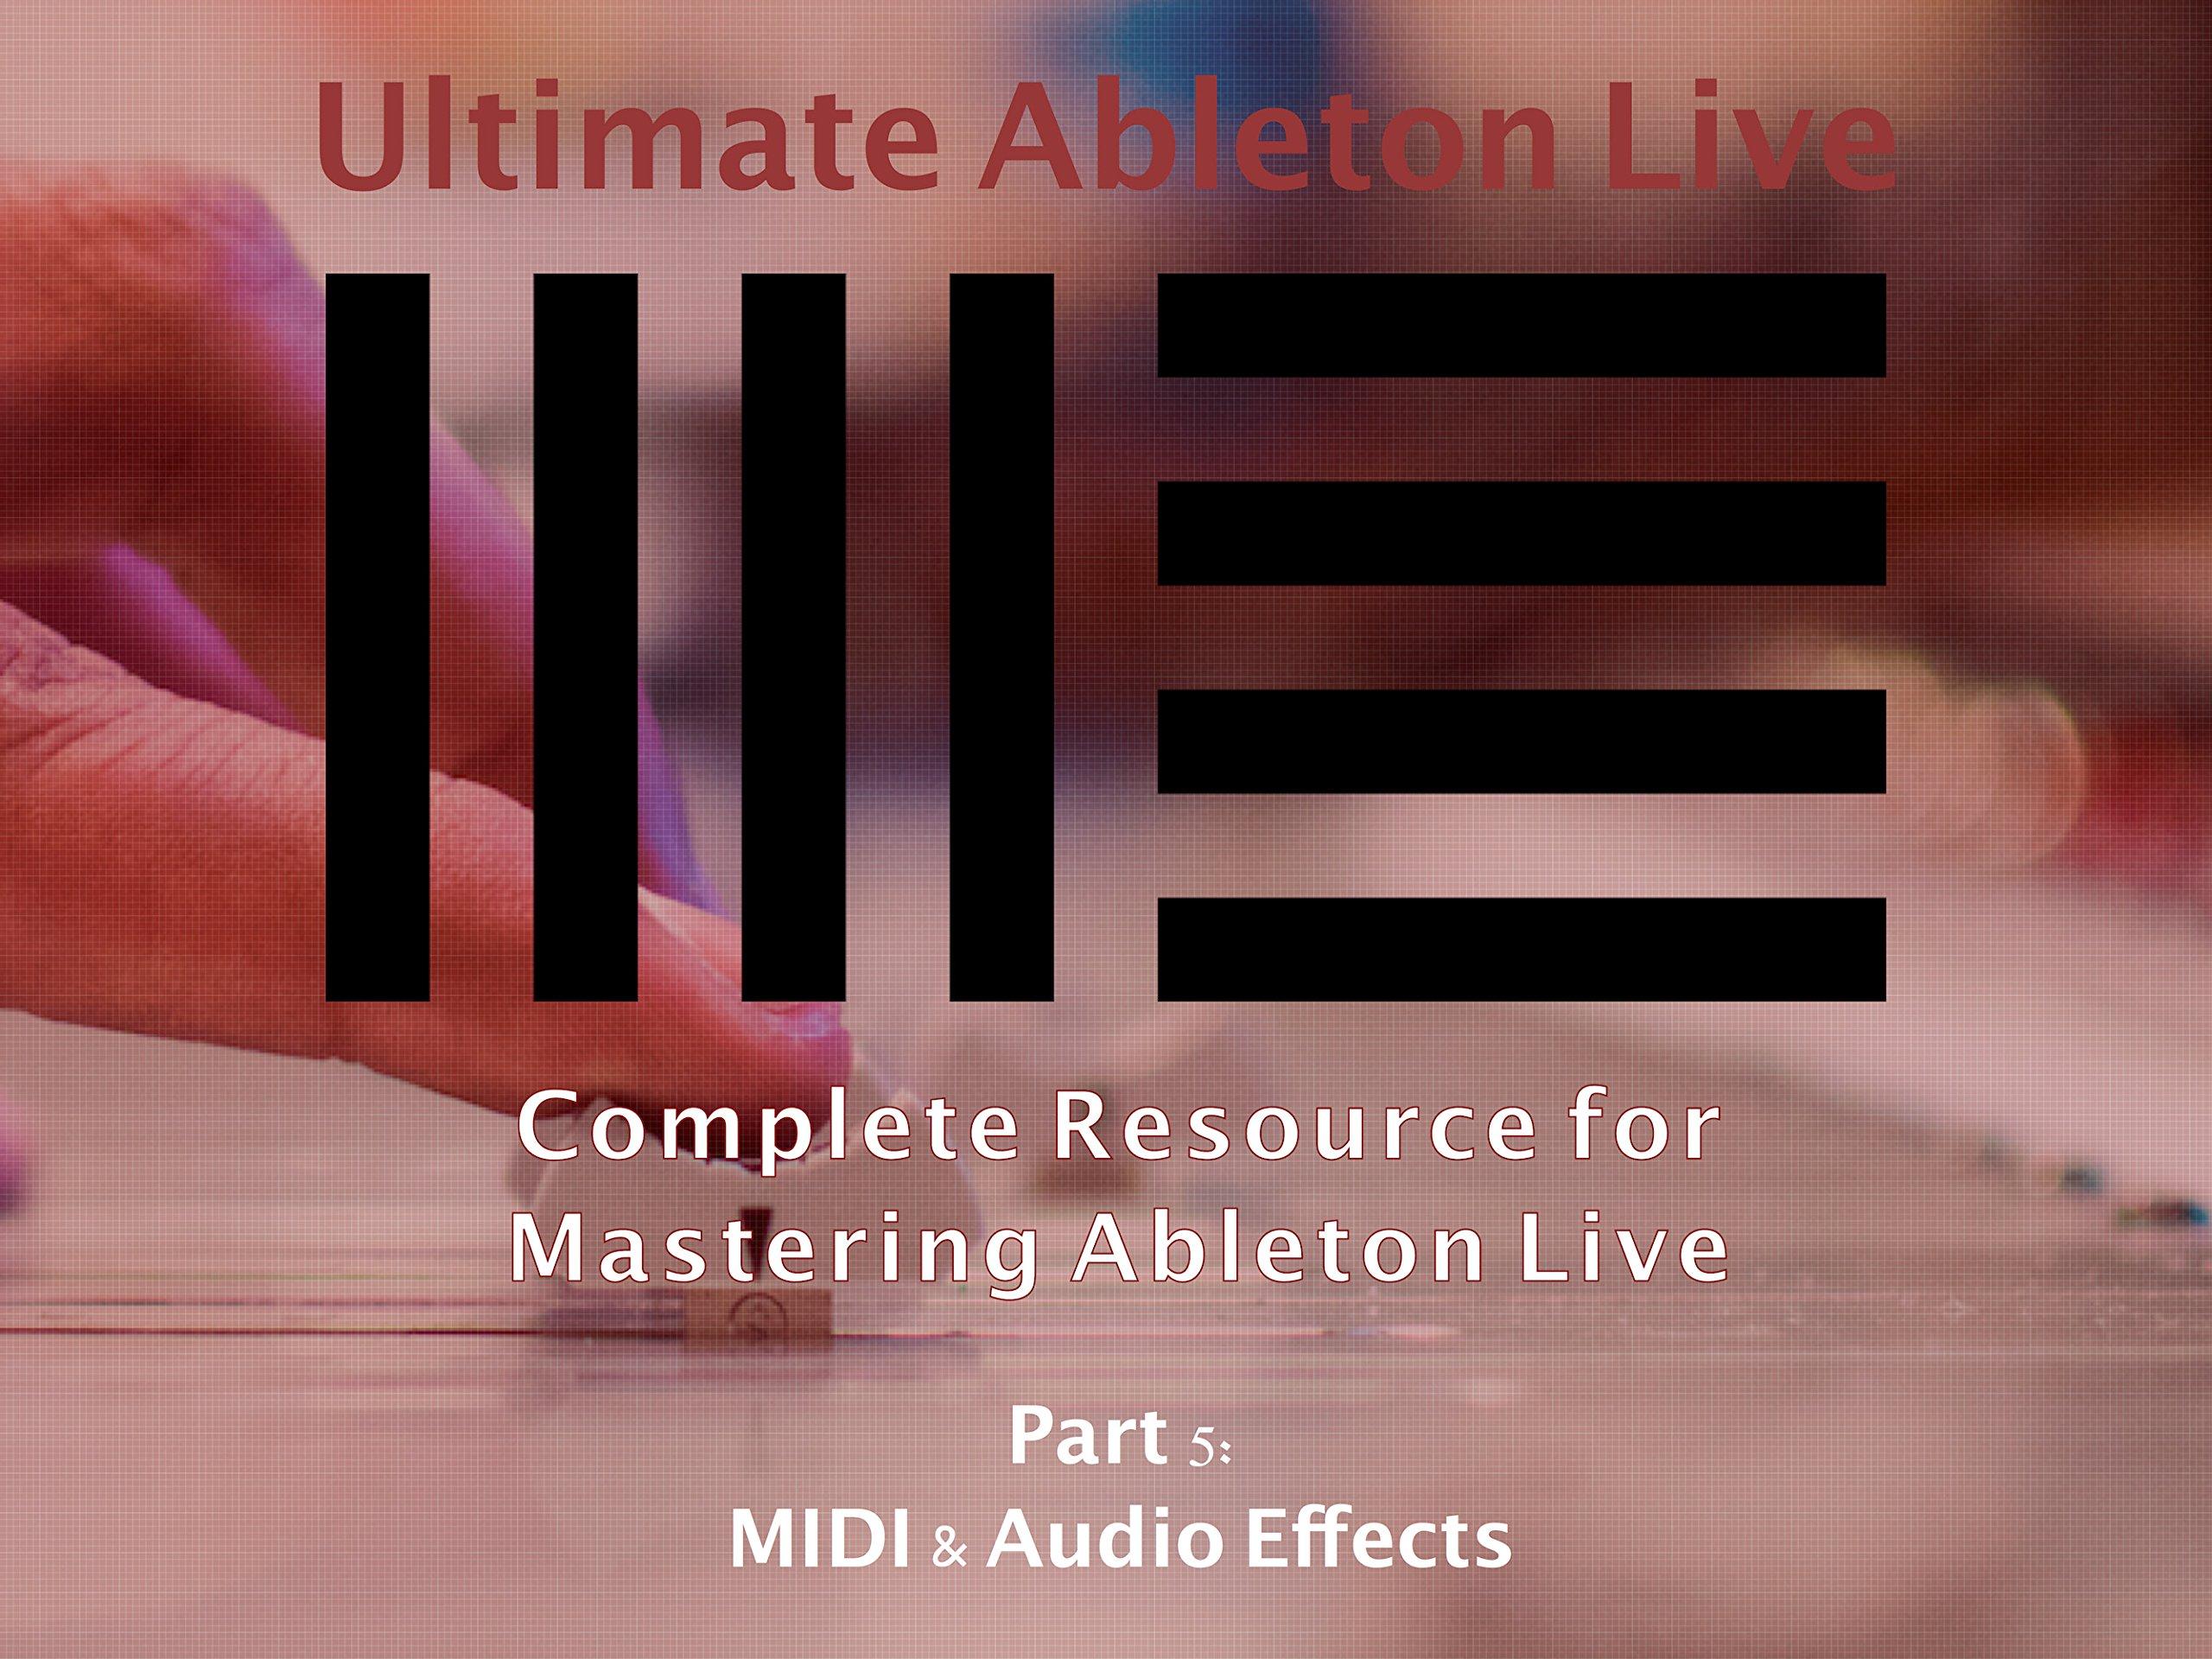 Amazon com: Watch Ultimate Ableton Live | Prime Video